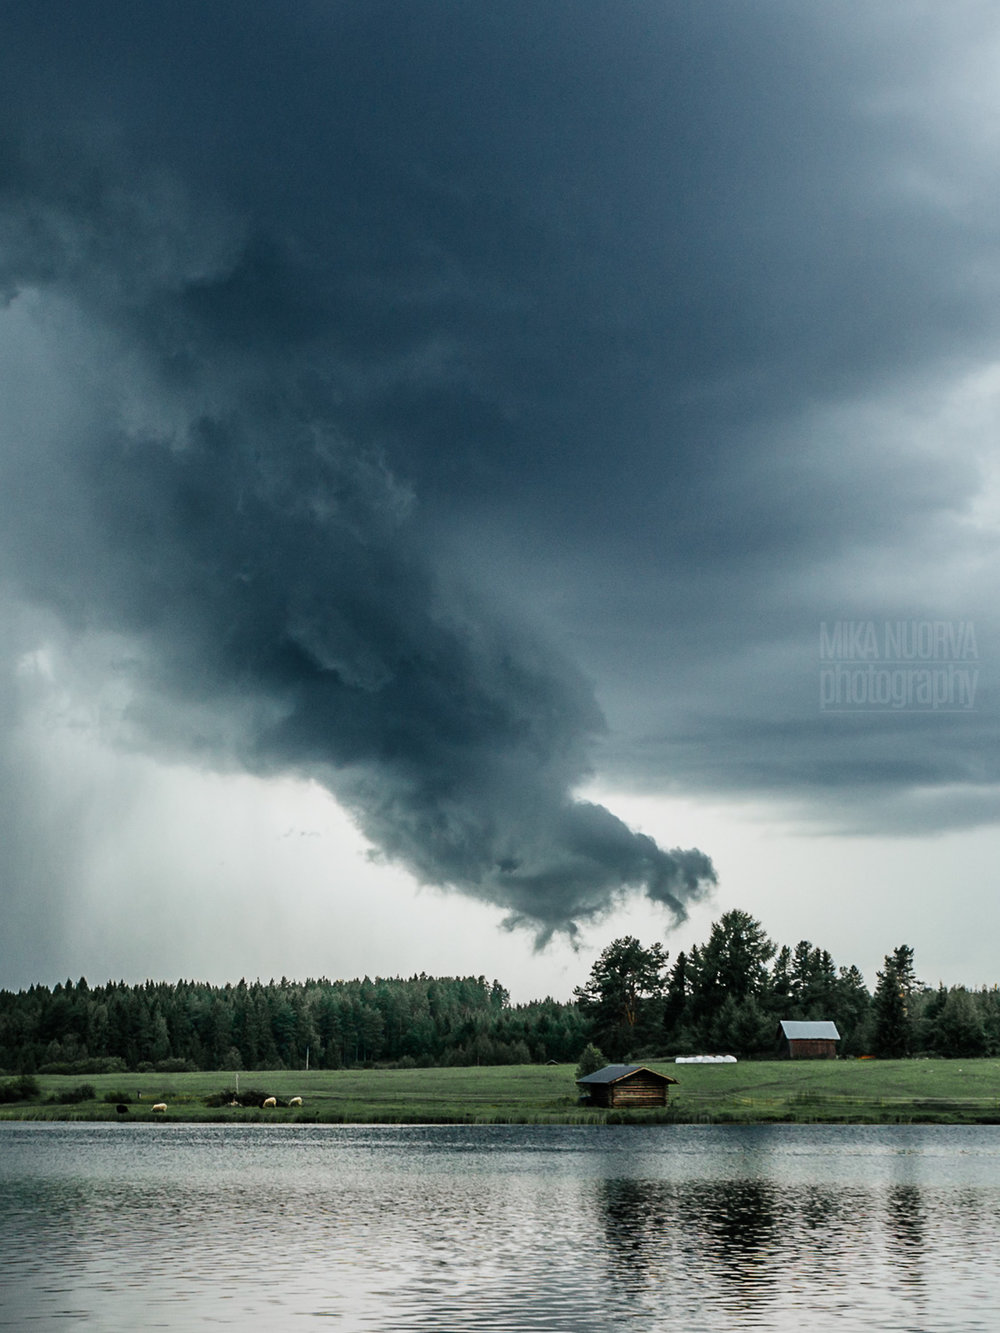 Hand of thunder